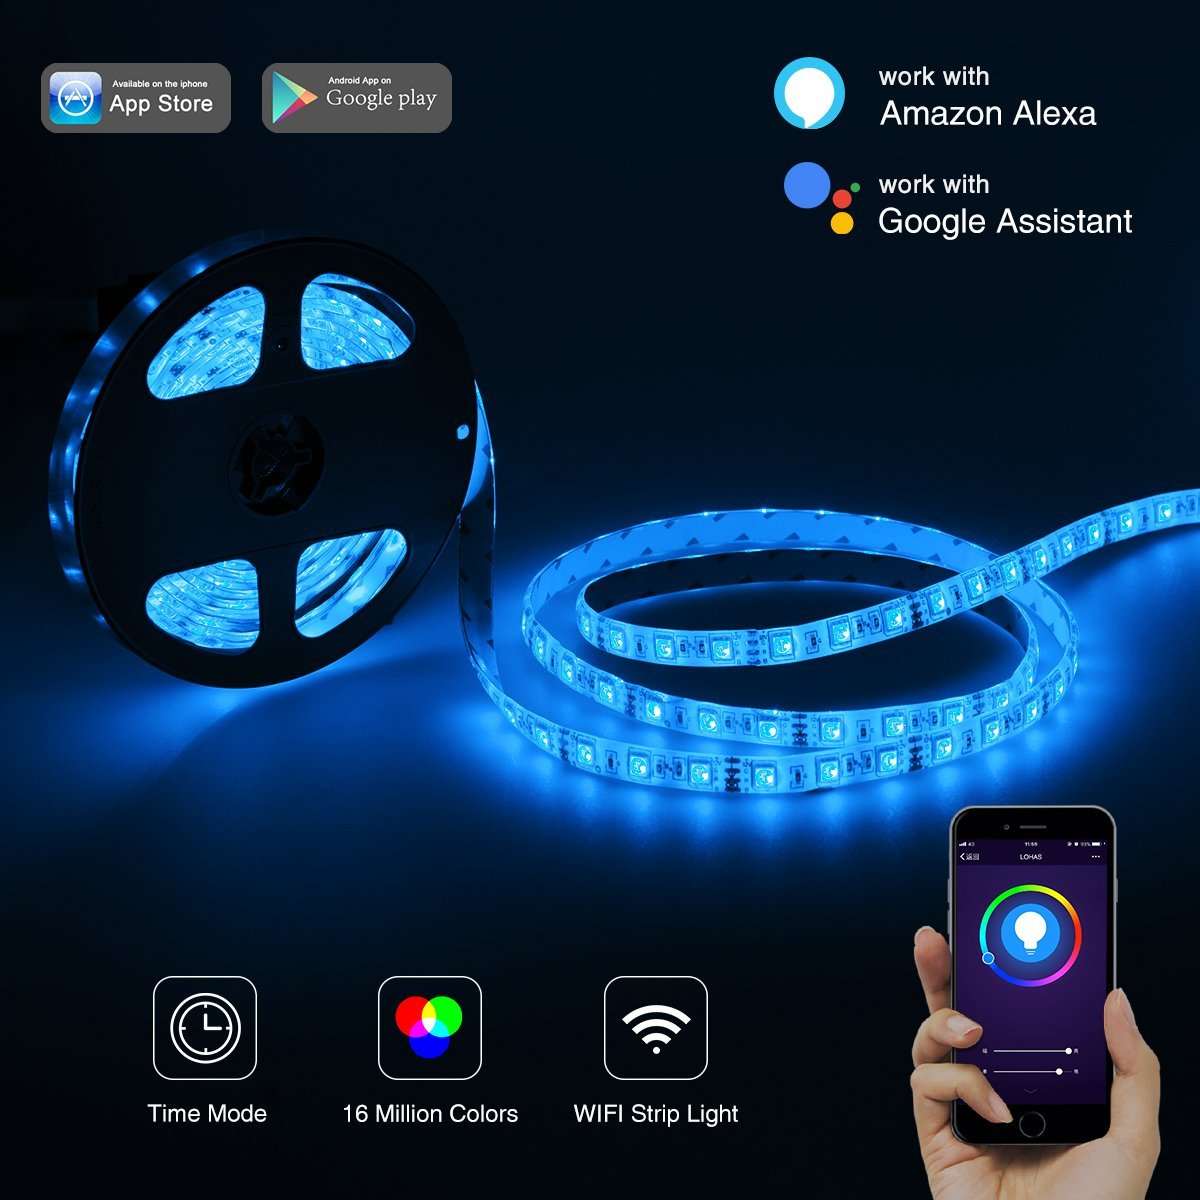 G4 Led Bulb >> LOHAS WIFI LED Strip Lights, Work with Amazon Aleax, Multicolored, 16.4FT, Smart Phone Control ...